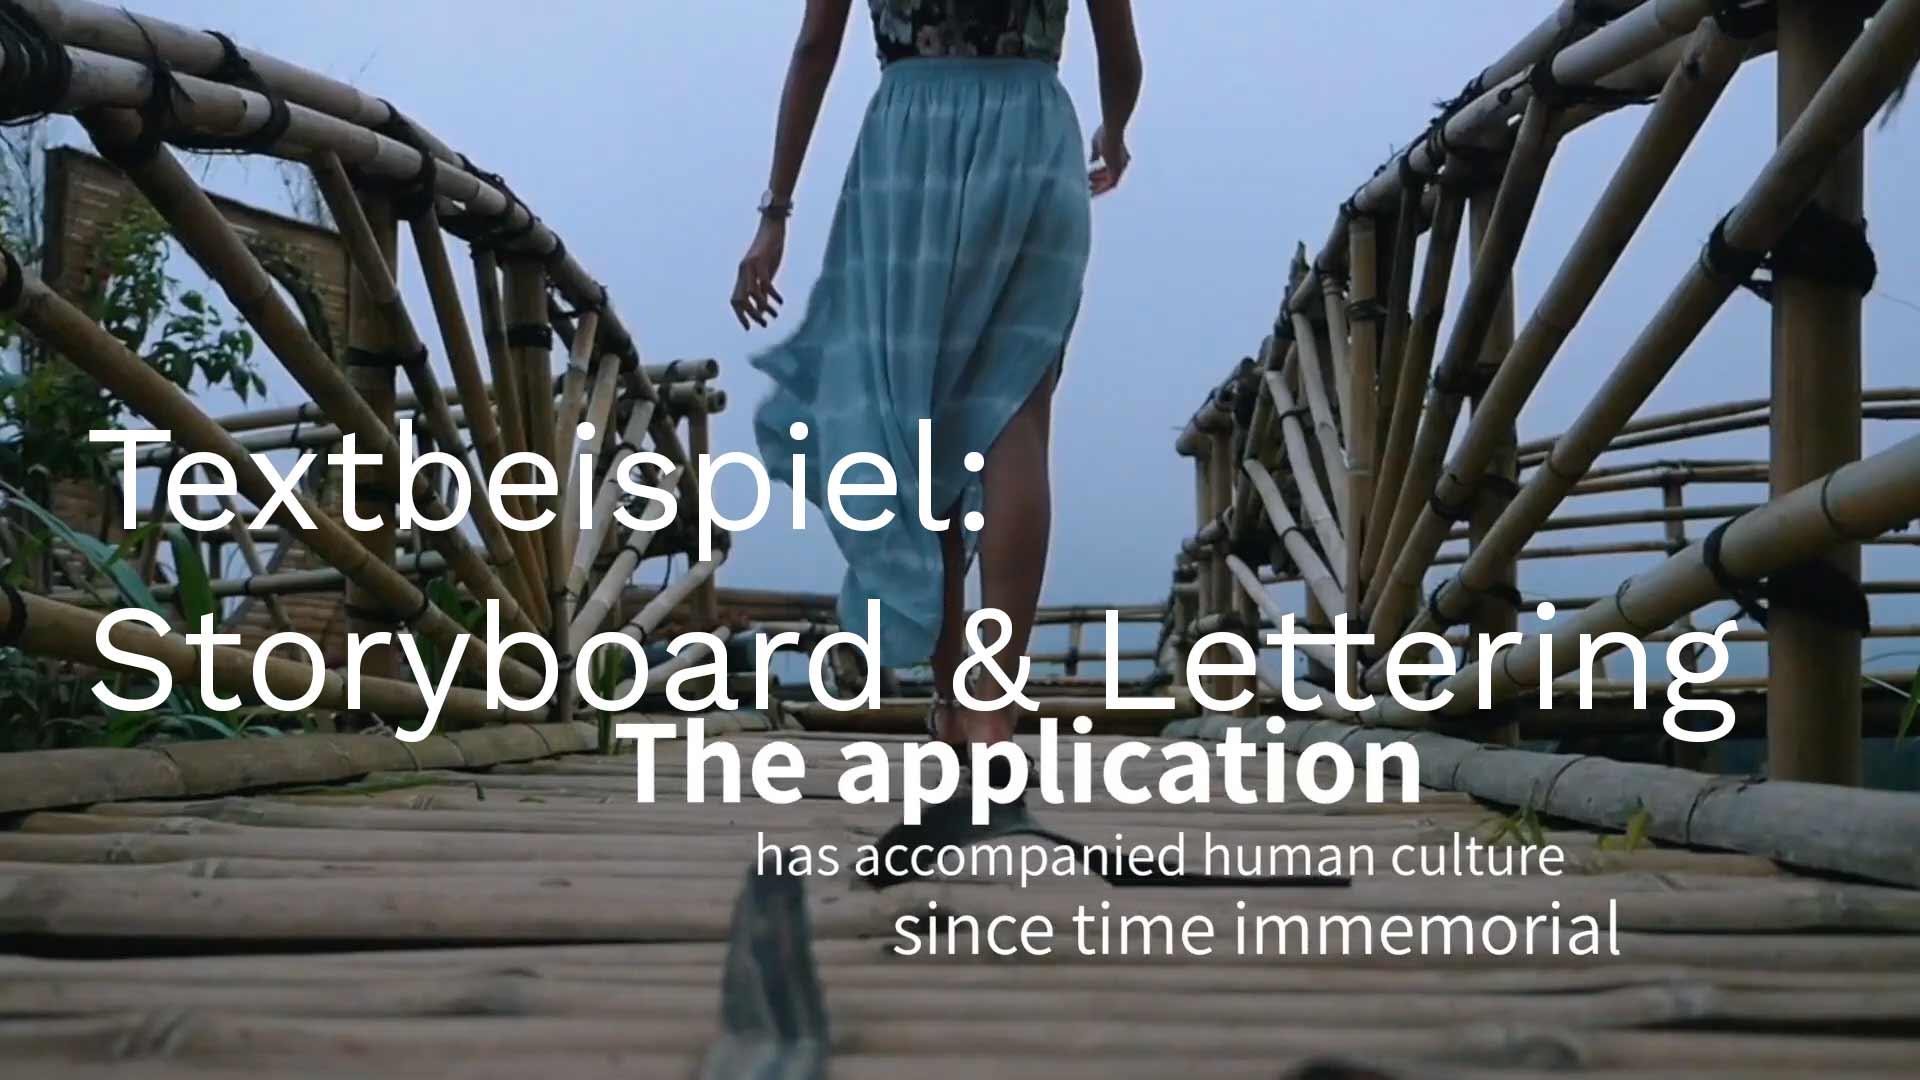 Texter-Storyboard-Lettering-Bielefeld